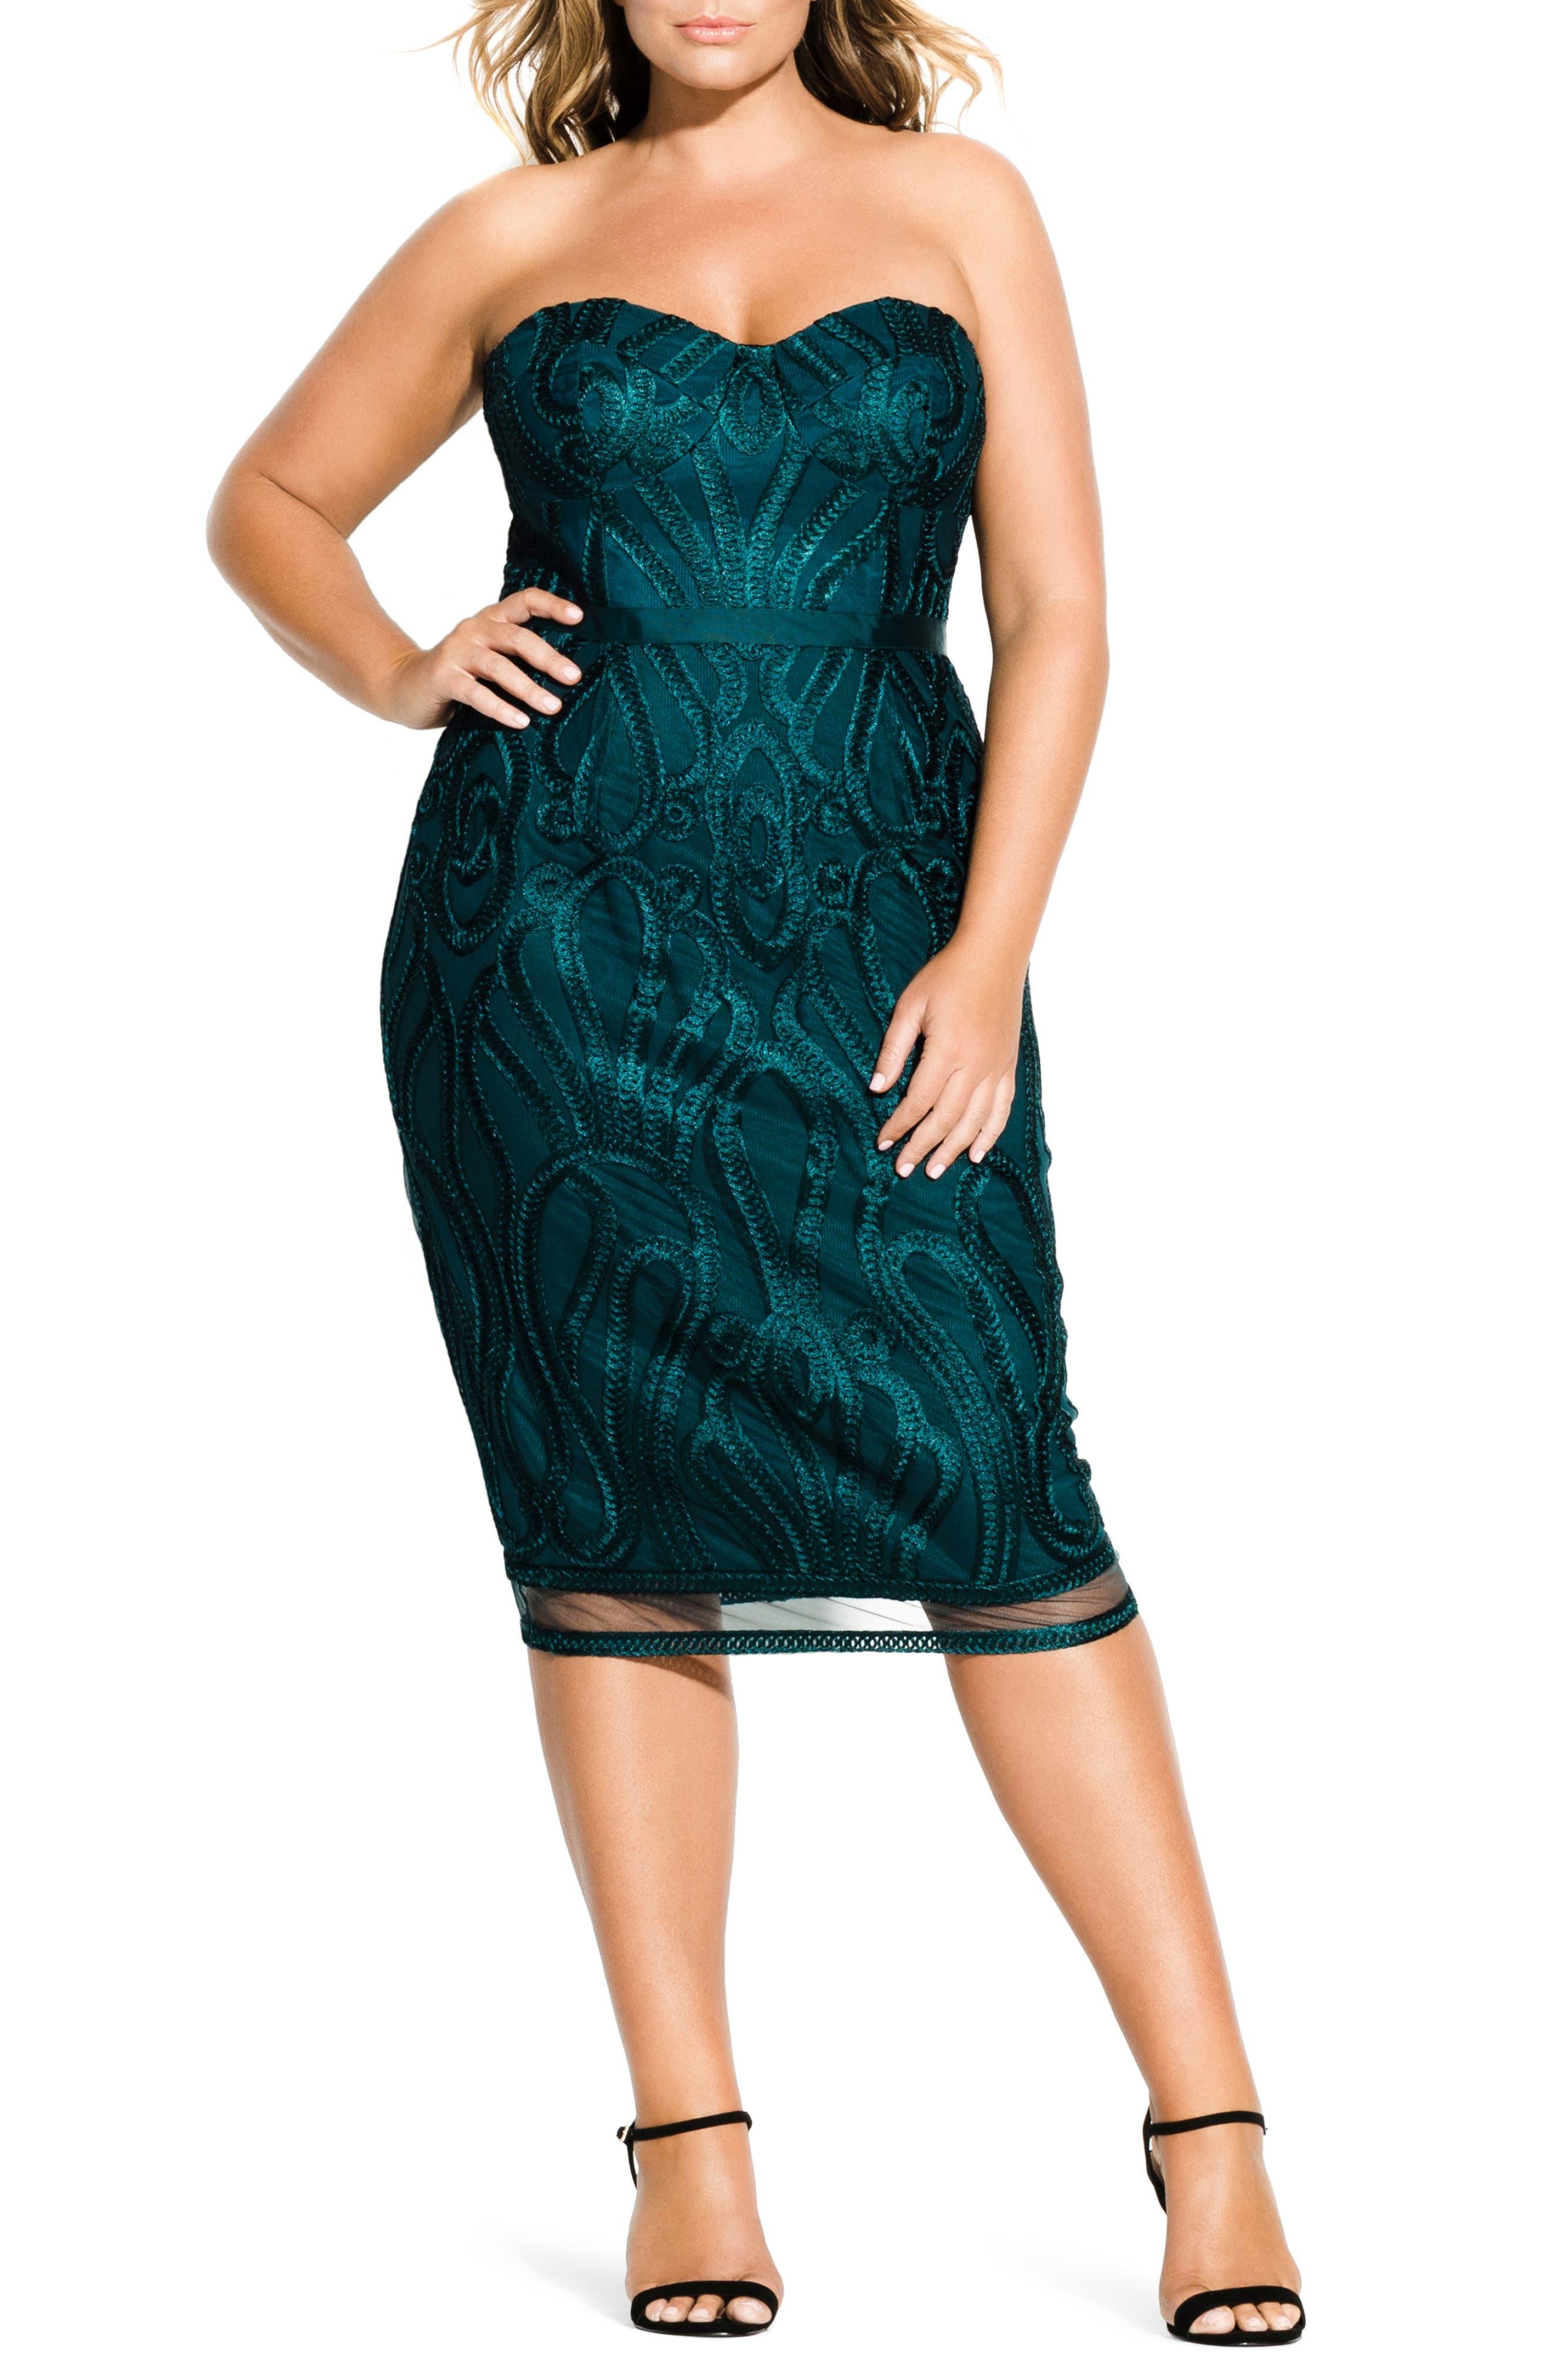 Plus Size City Chic Antonia Strapless Sheath Dress